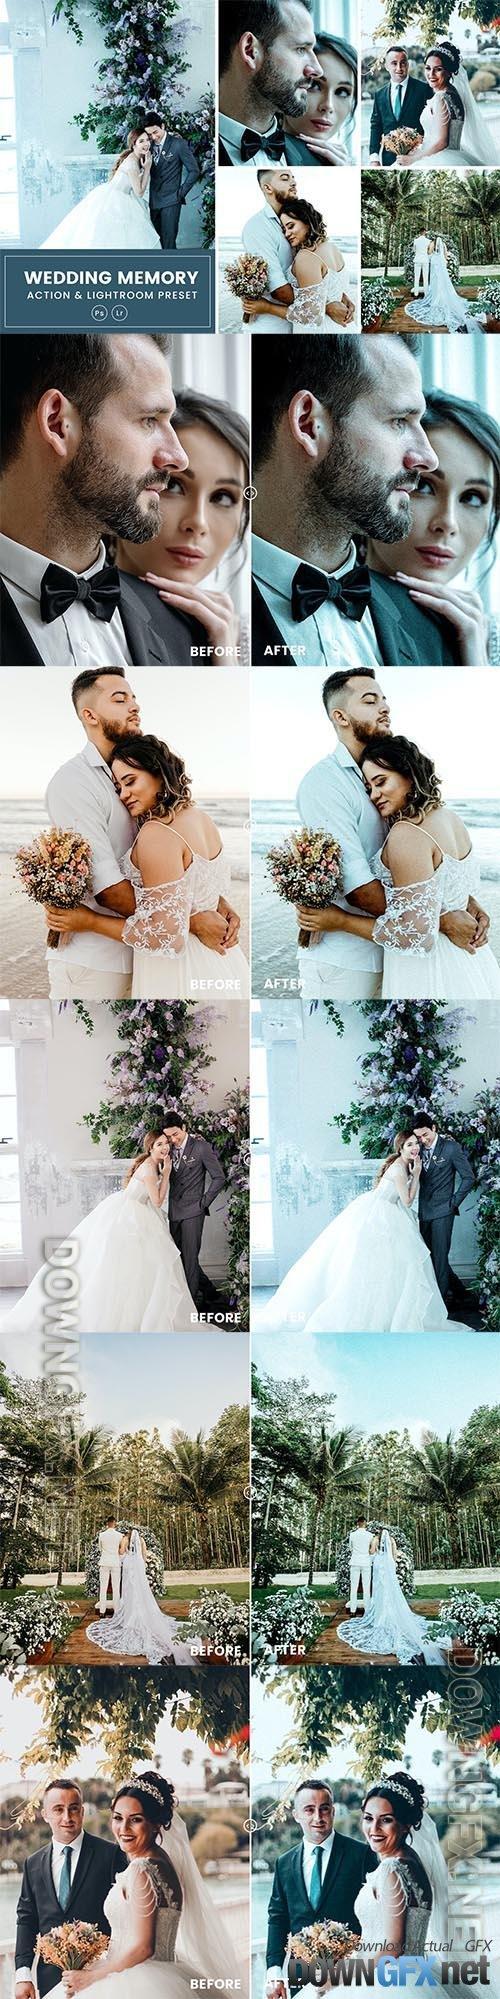 Wedding Memory Action & Lightrom Presets